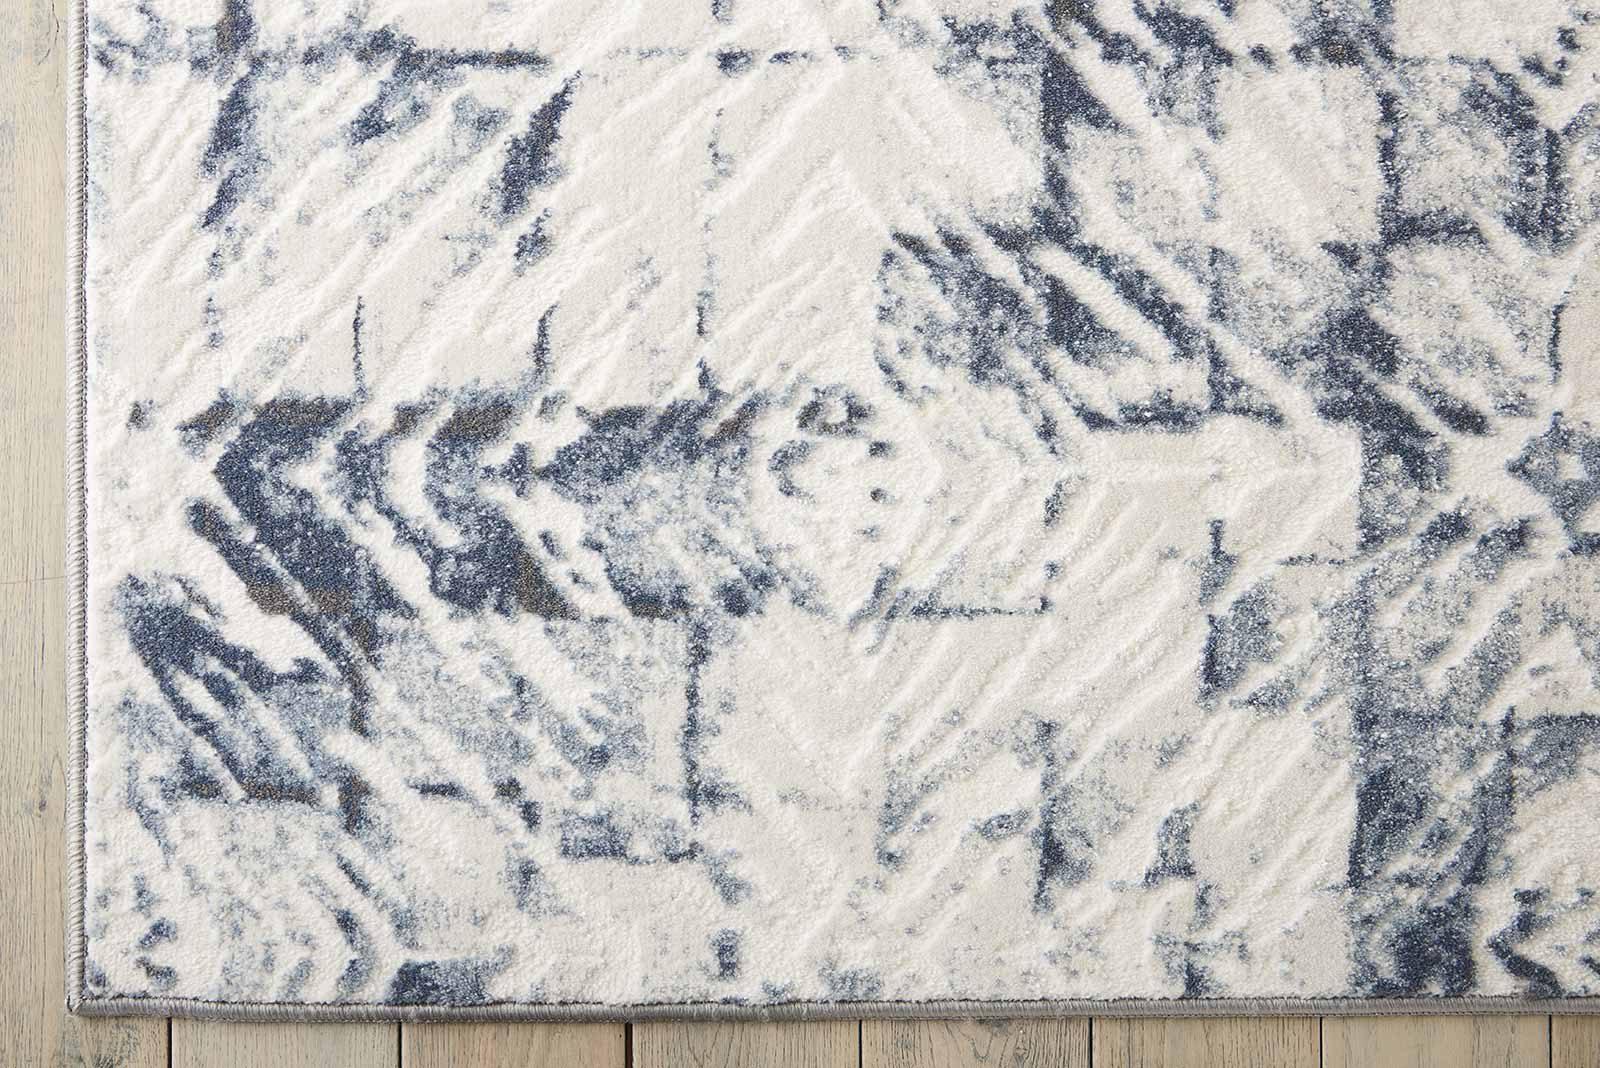 Nourison rug Urban Decor URD02 IVORY BLUE 5x7 099446466976 CR01